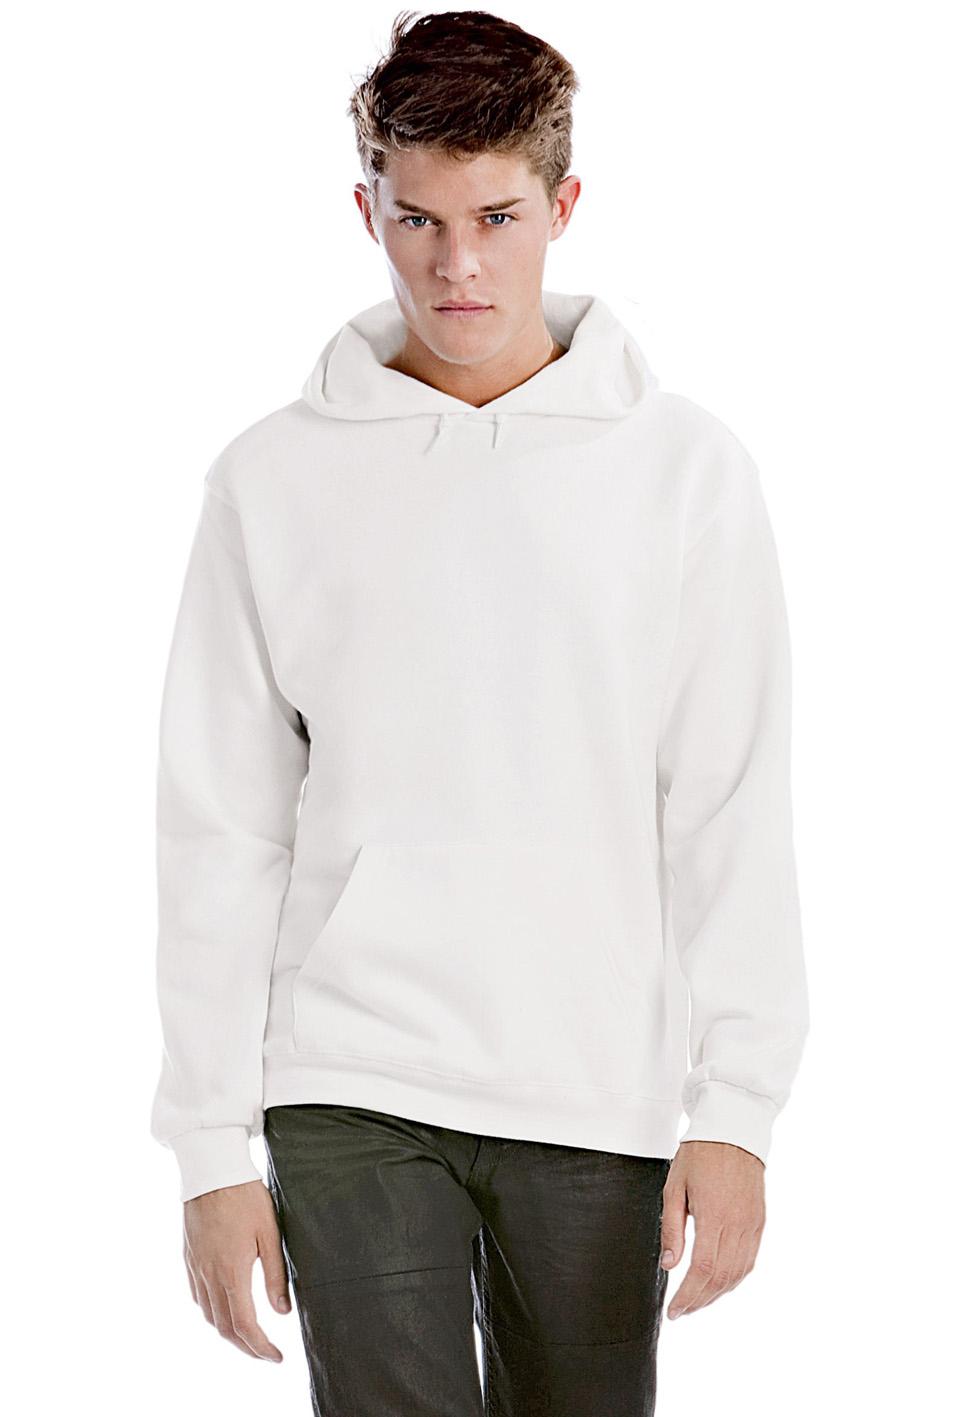 B&C Hooded Sweat-shirt